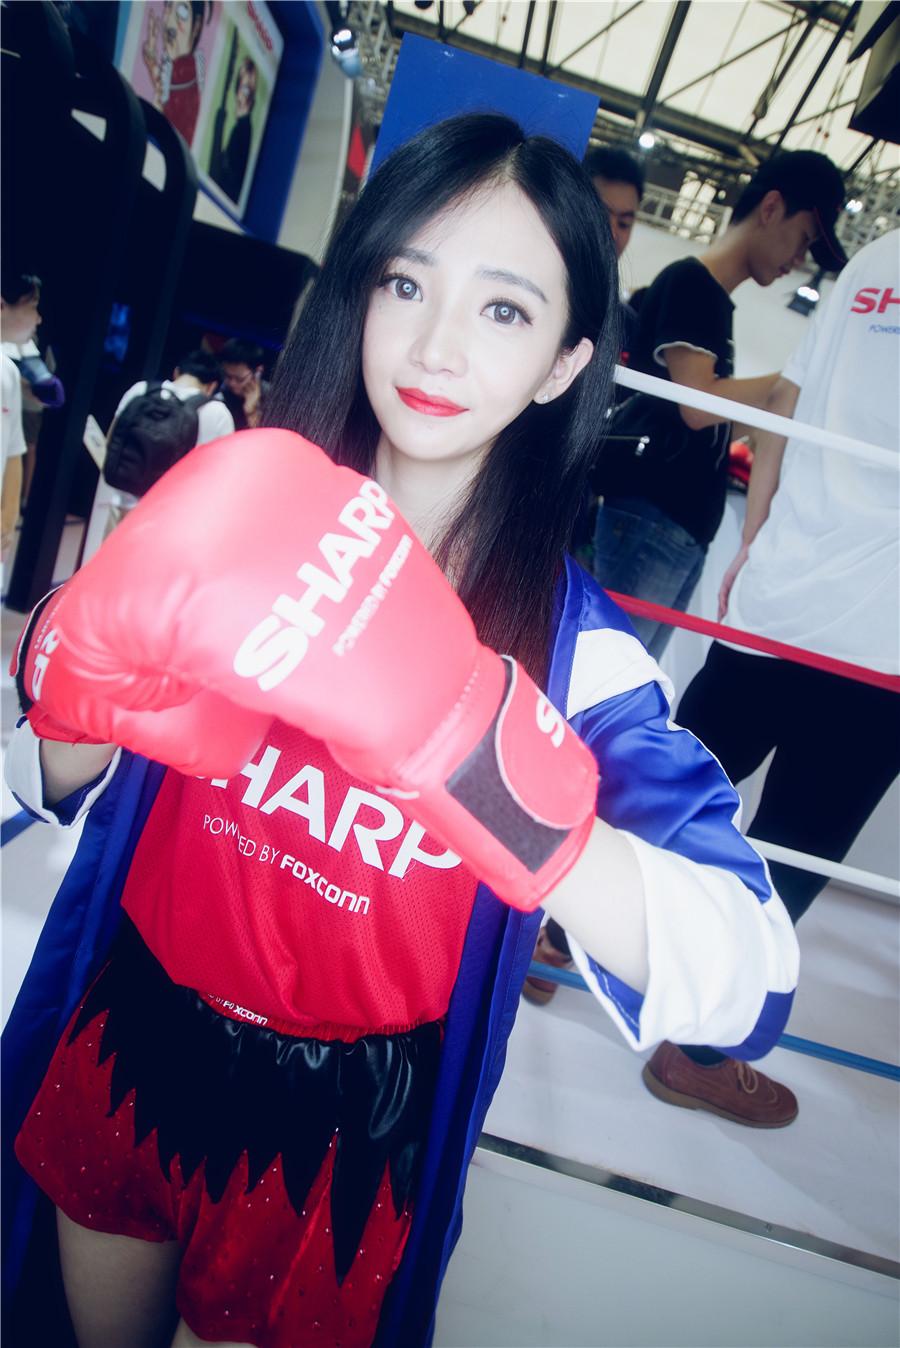 Chinajoy2017夏普展台showgirl唤起童年记忆